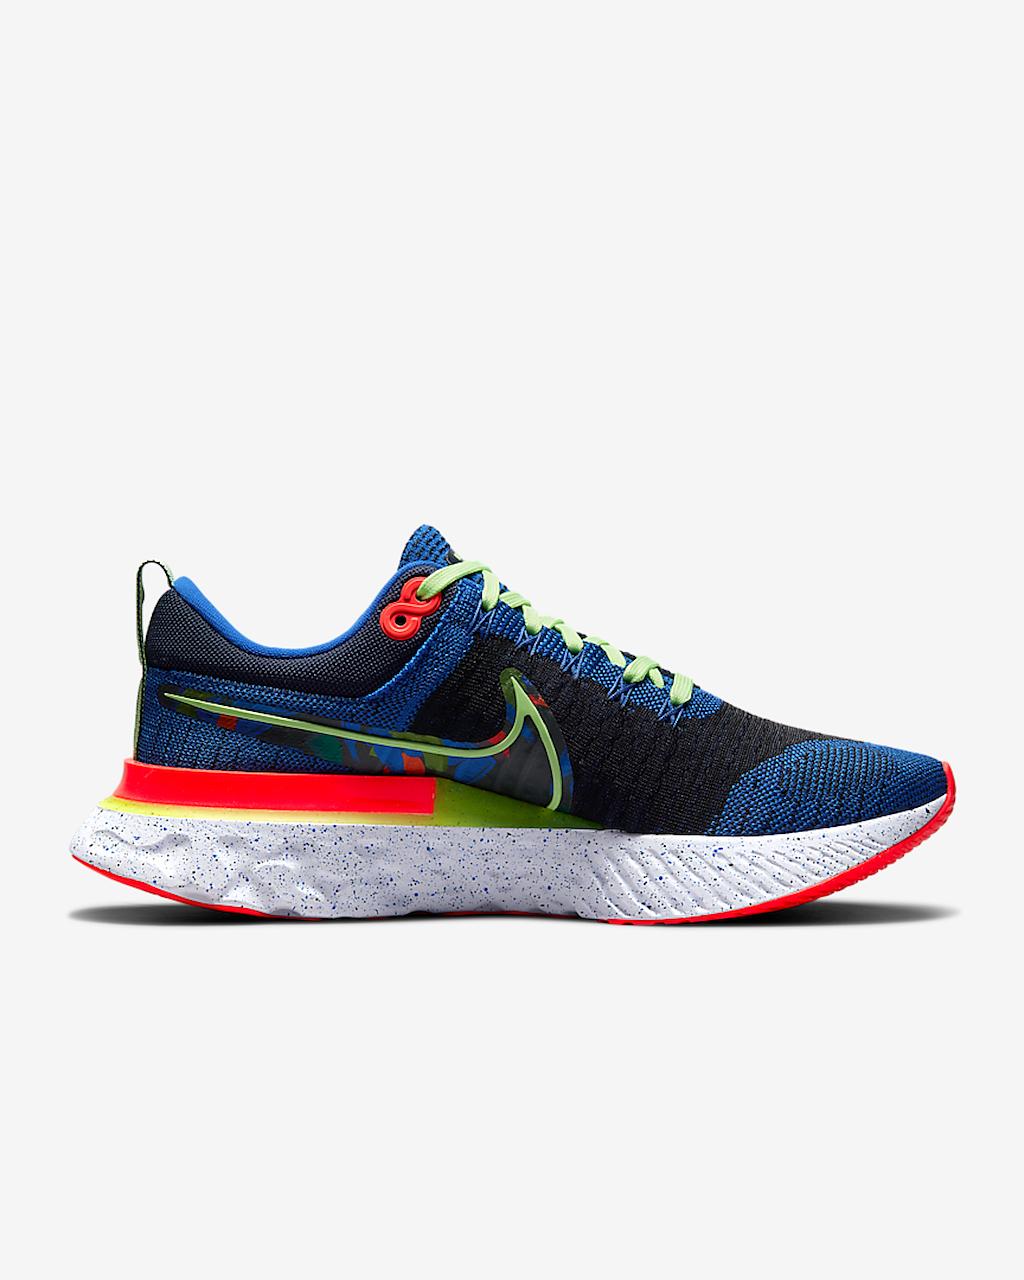 Nike React Infinity Run Flyknit 2 A